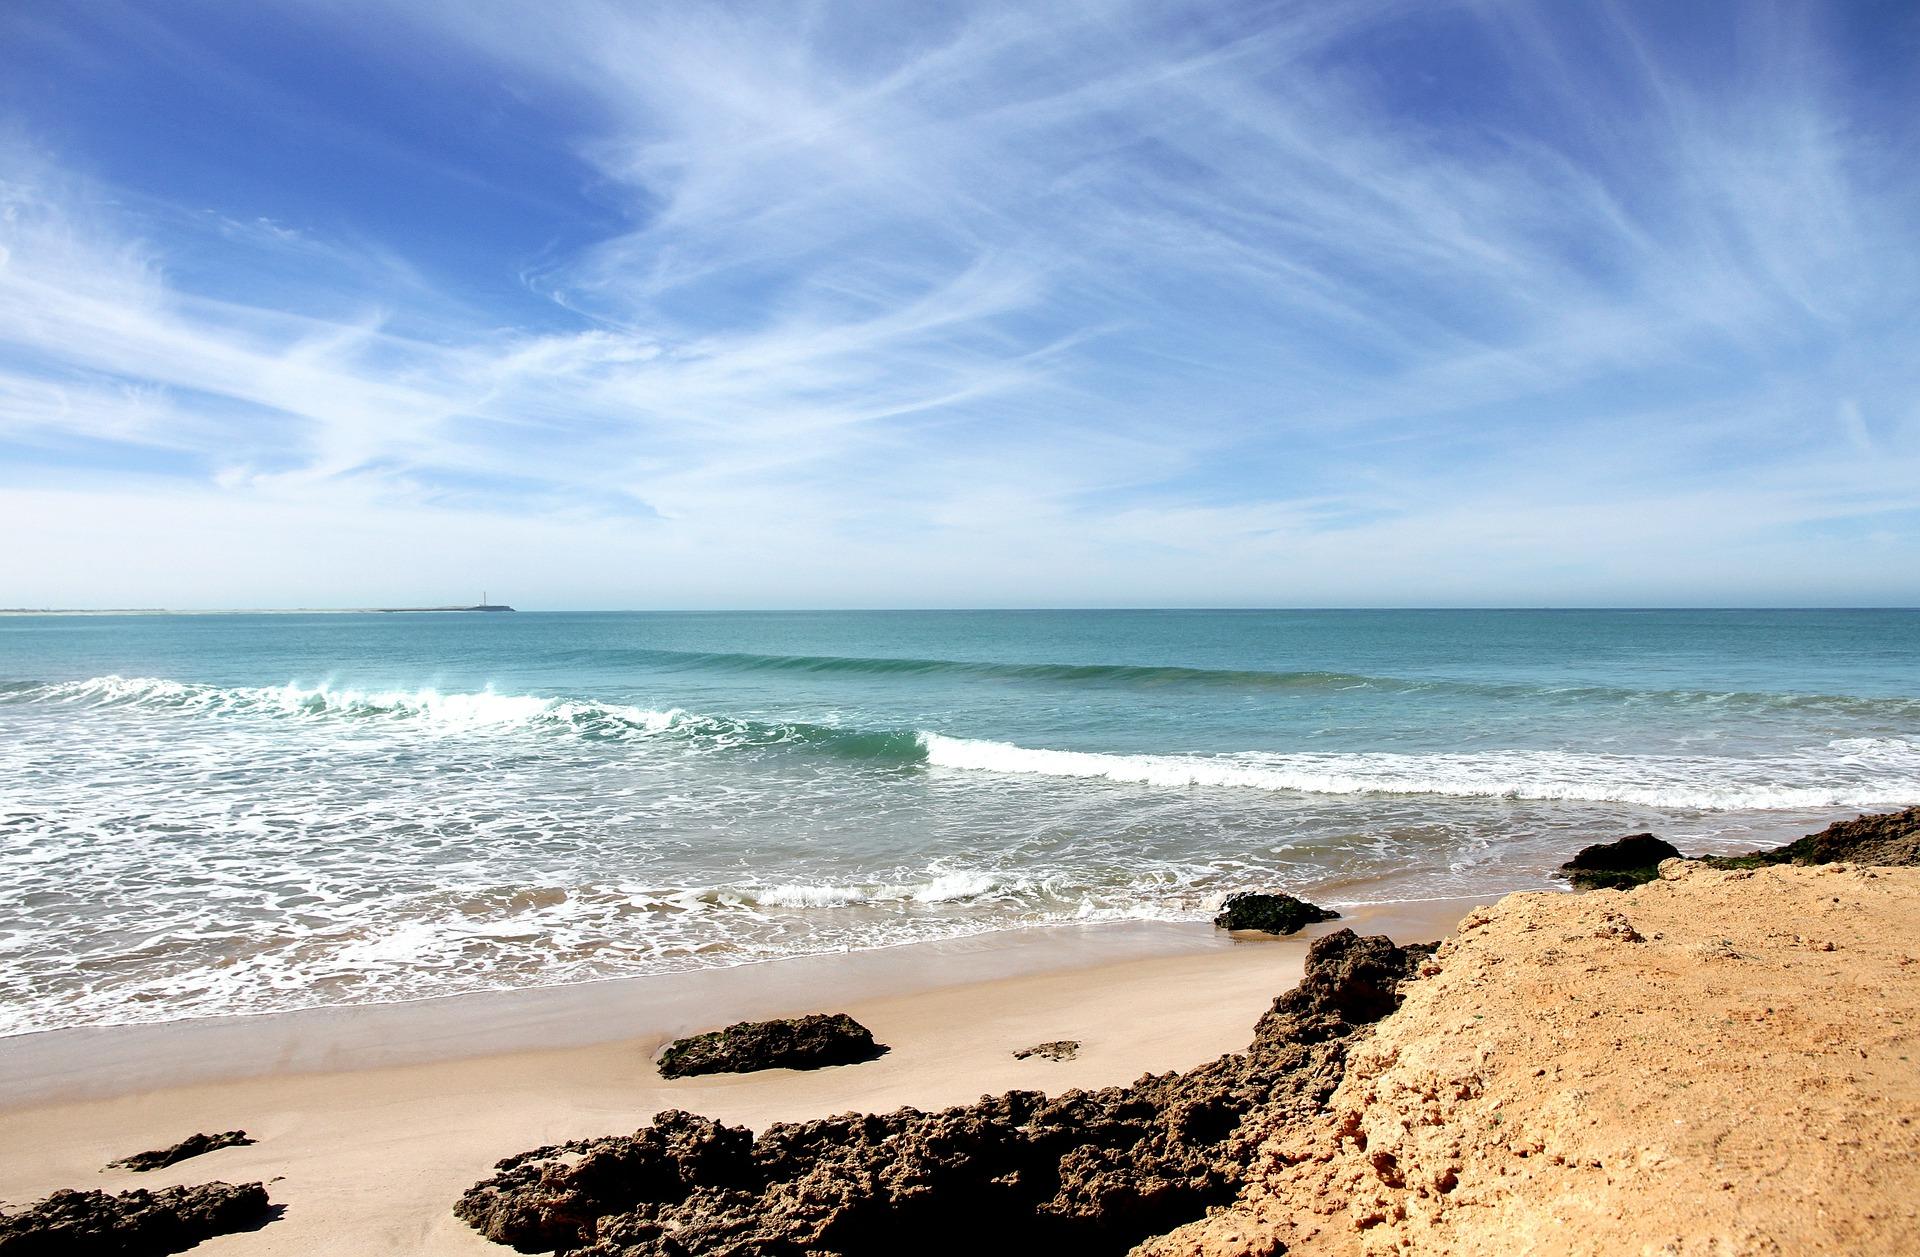 1 Woche Urlaub in Marokko Agadir günstig buchen ab 105,00€